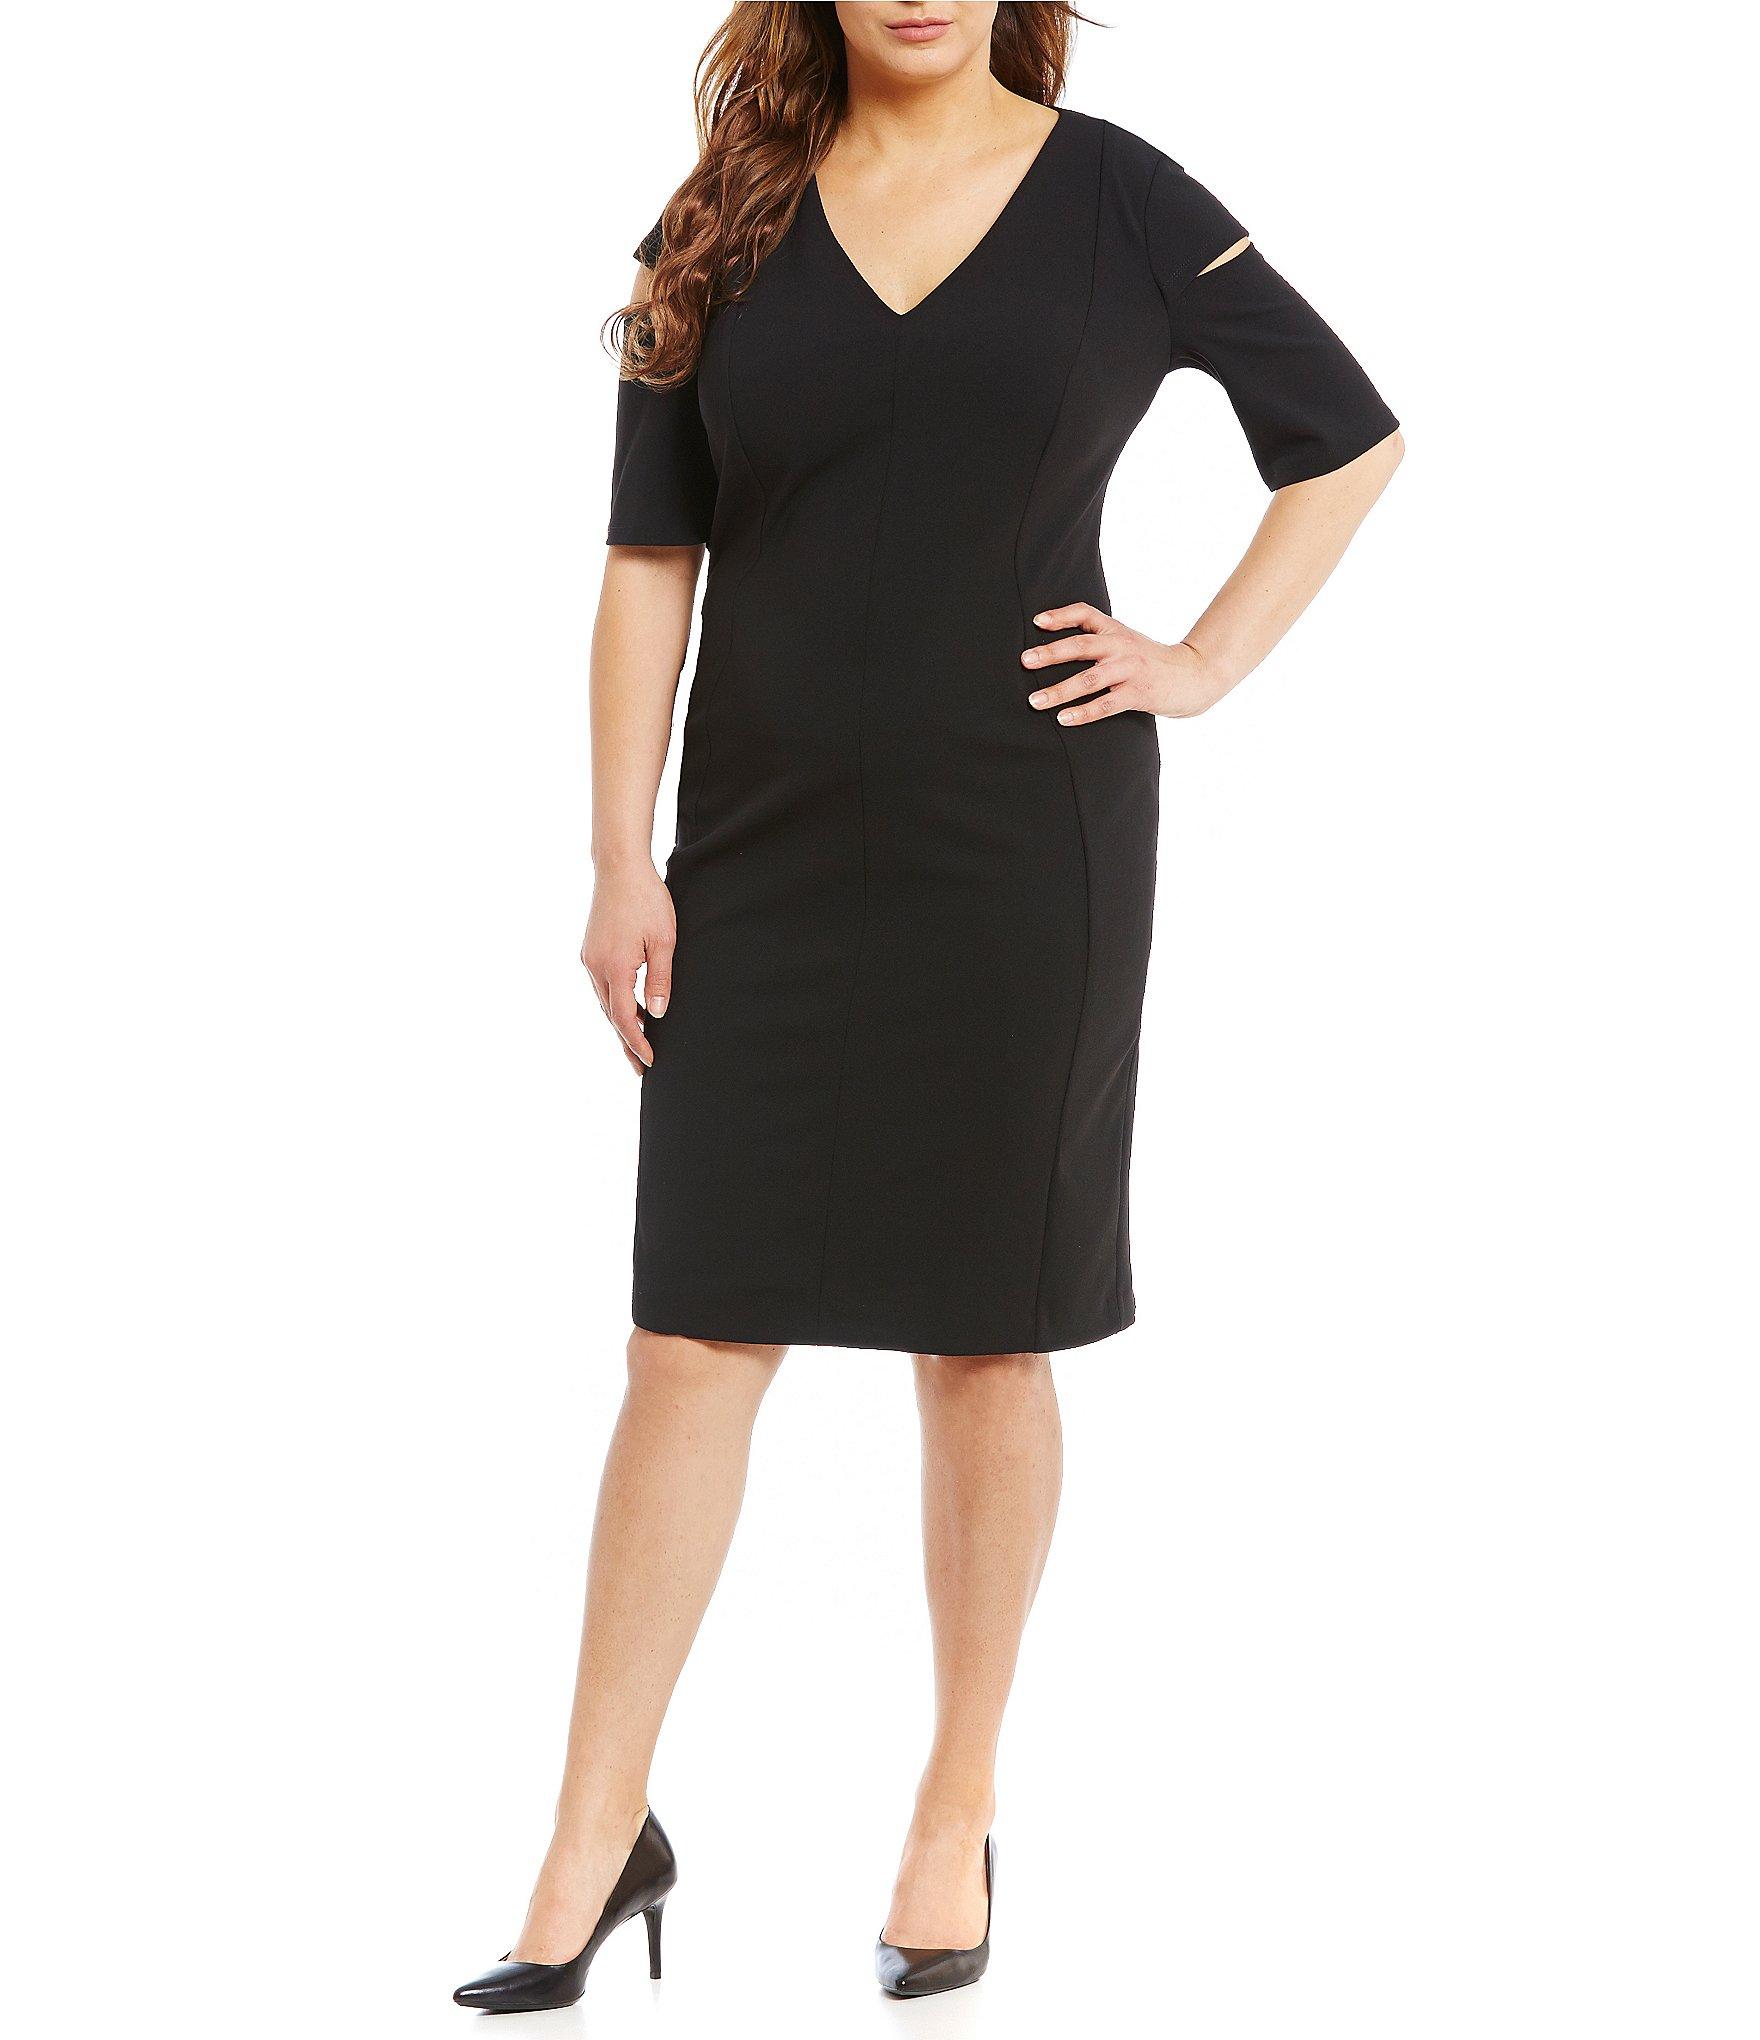 Plus-Size Daytime & Casual Dresses   Dillards